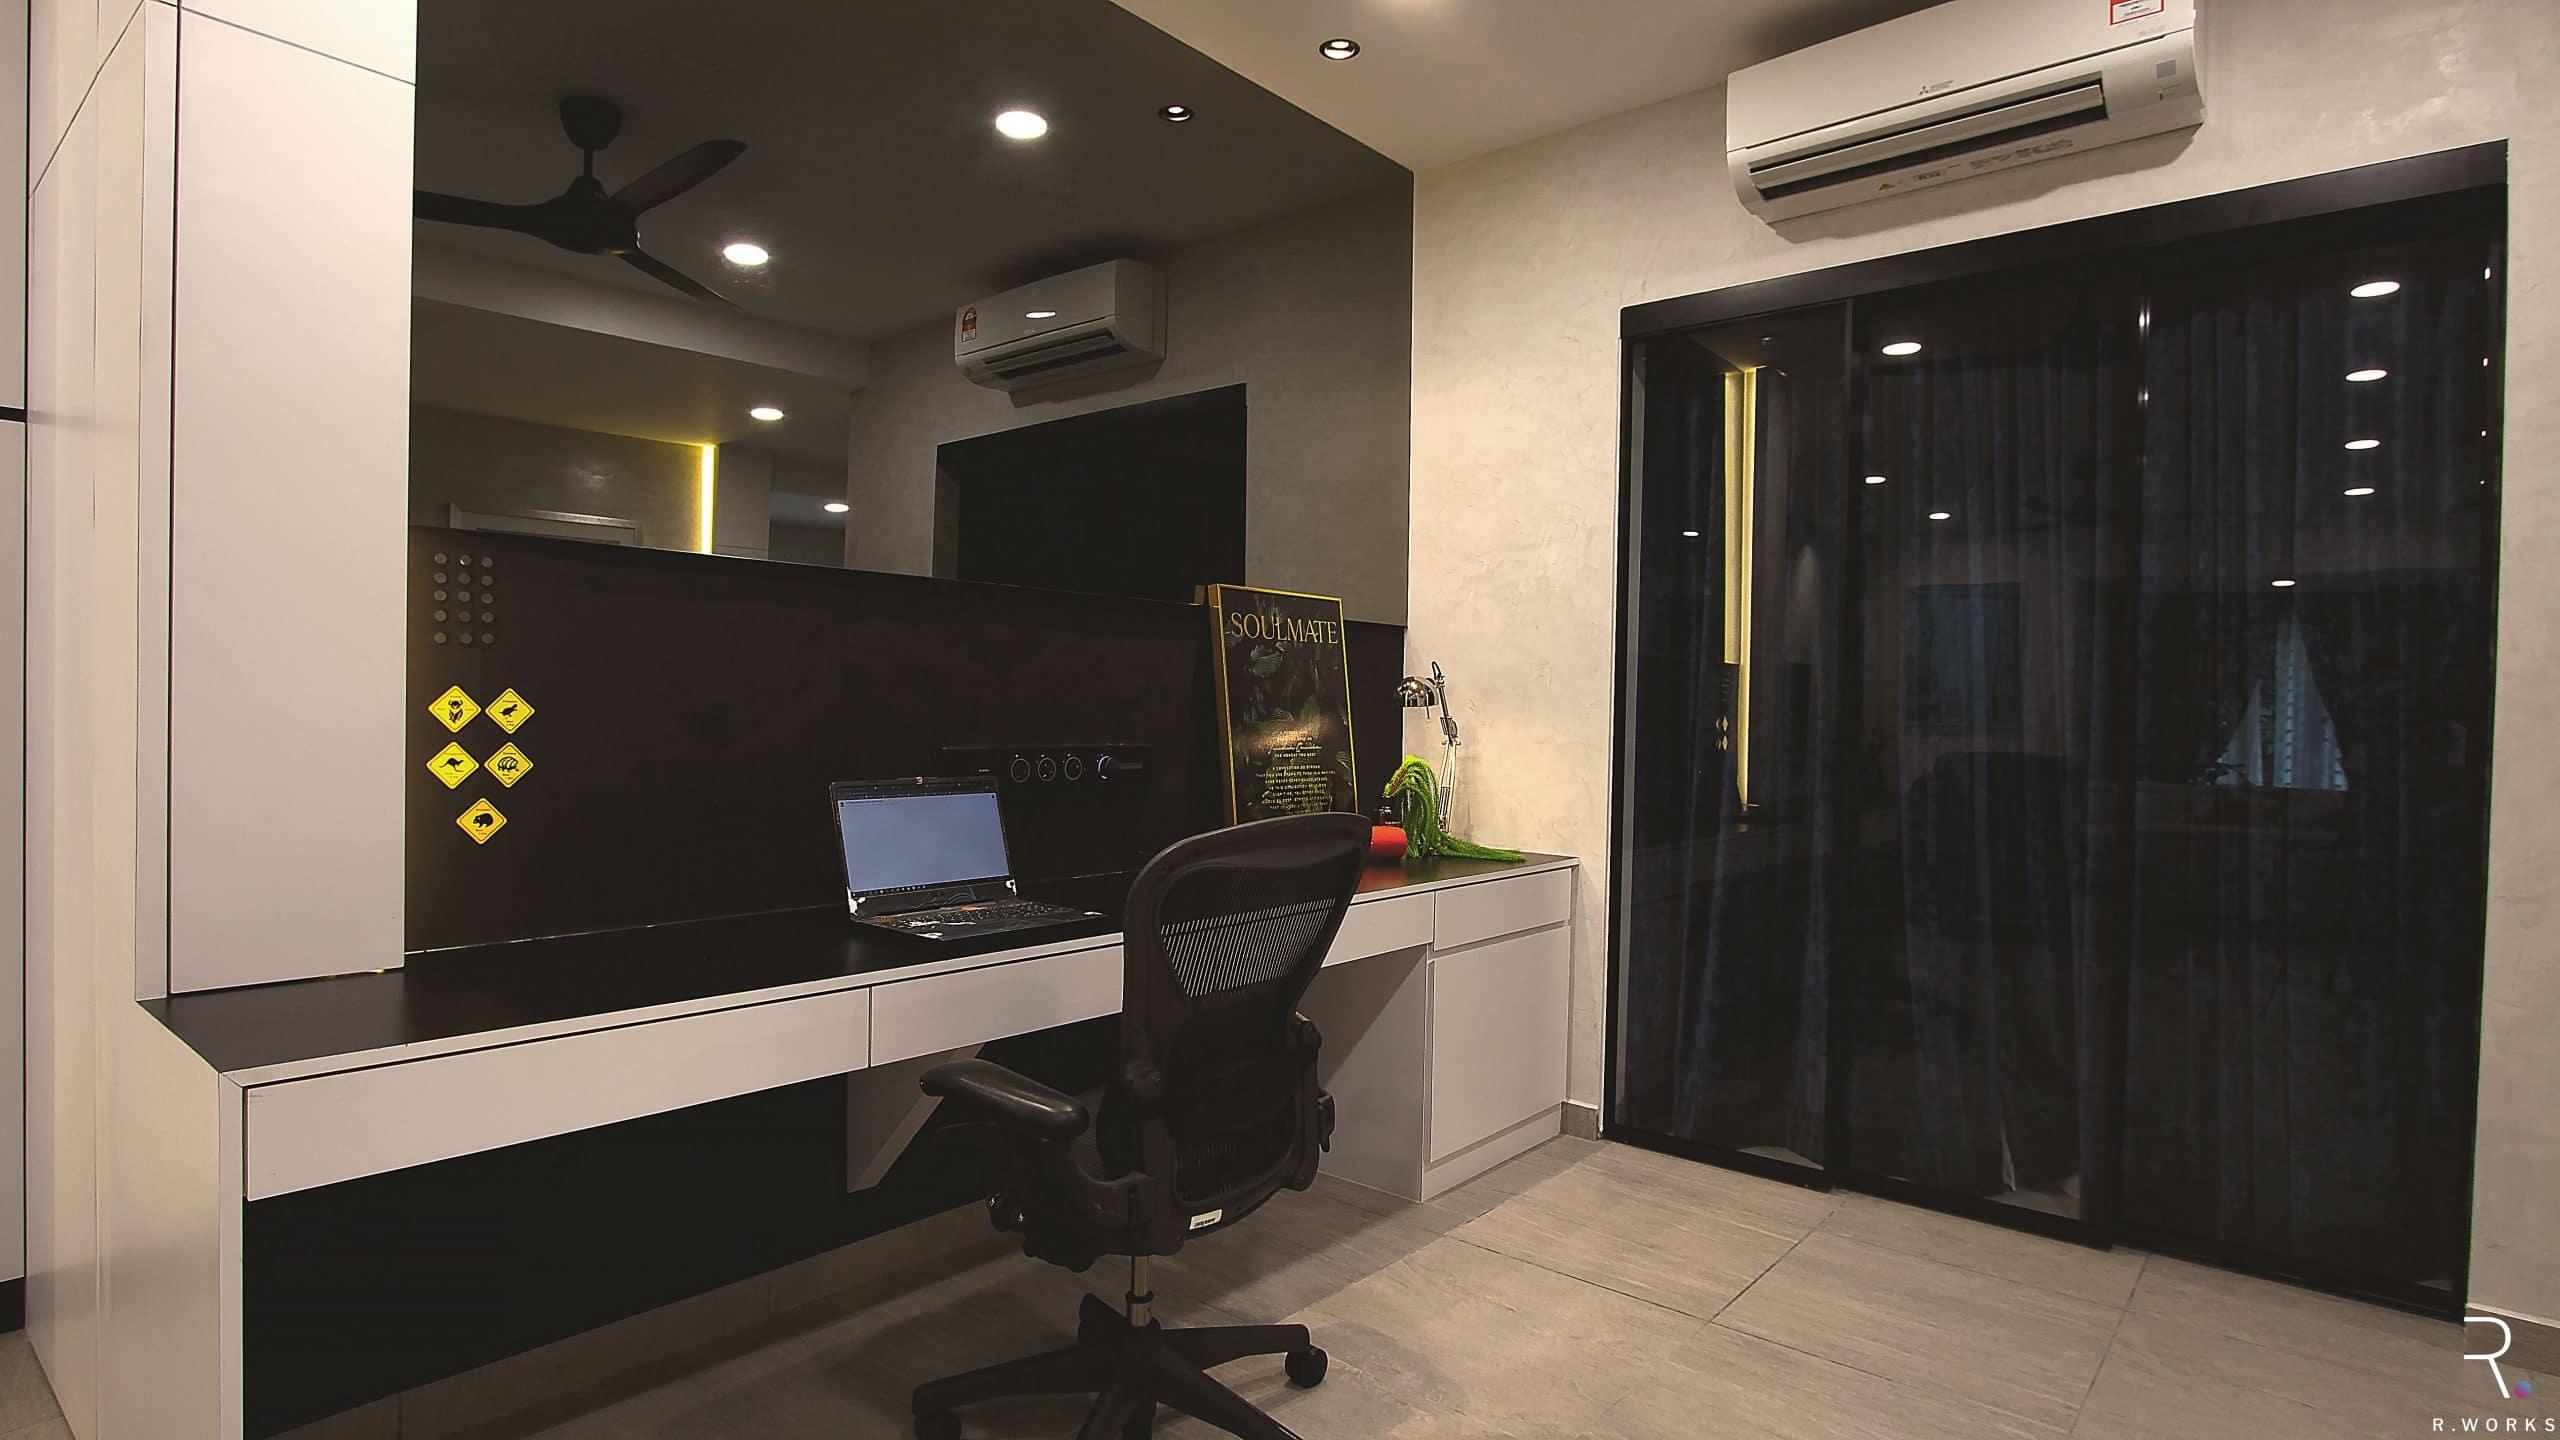 Monochrome study area for townhouse interior design